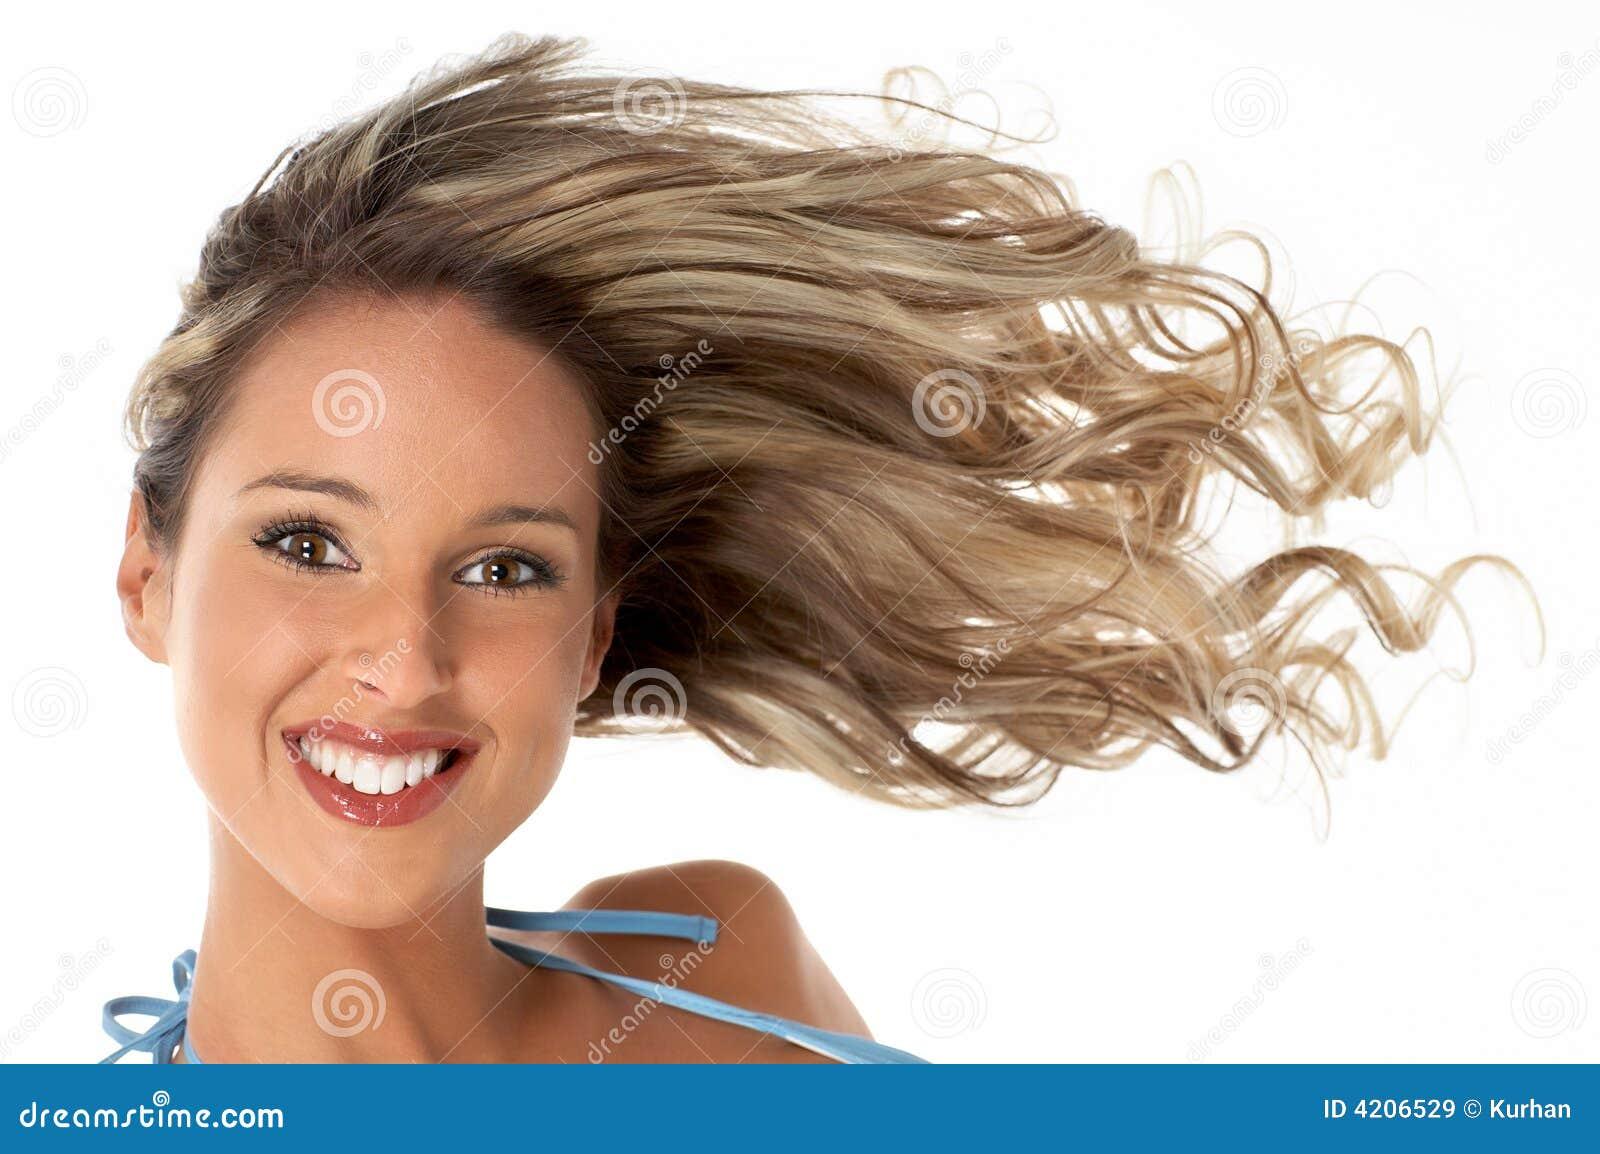 hairstyle stock image. image of joyful, happiness, fresh